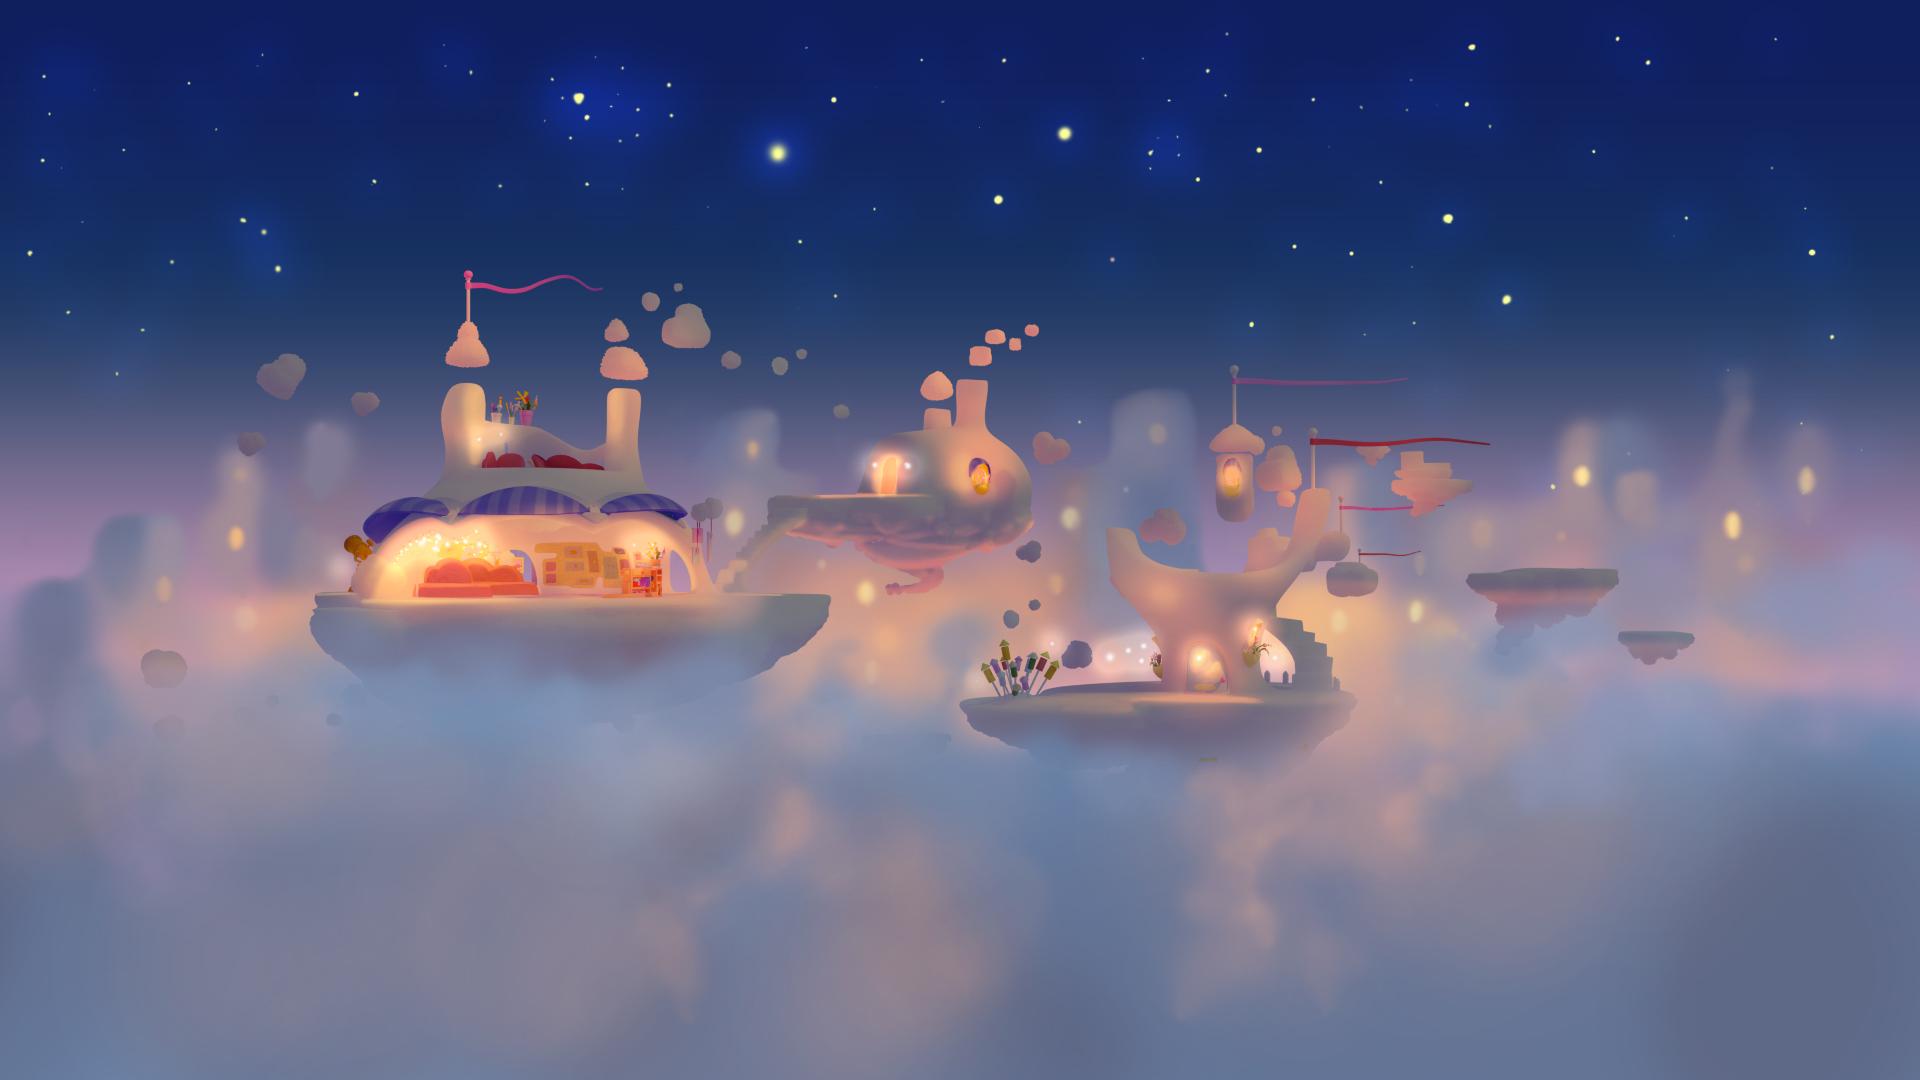 CloudVille_Night_01.jpg